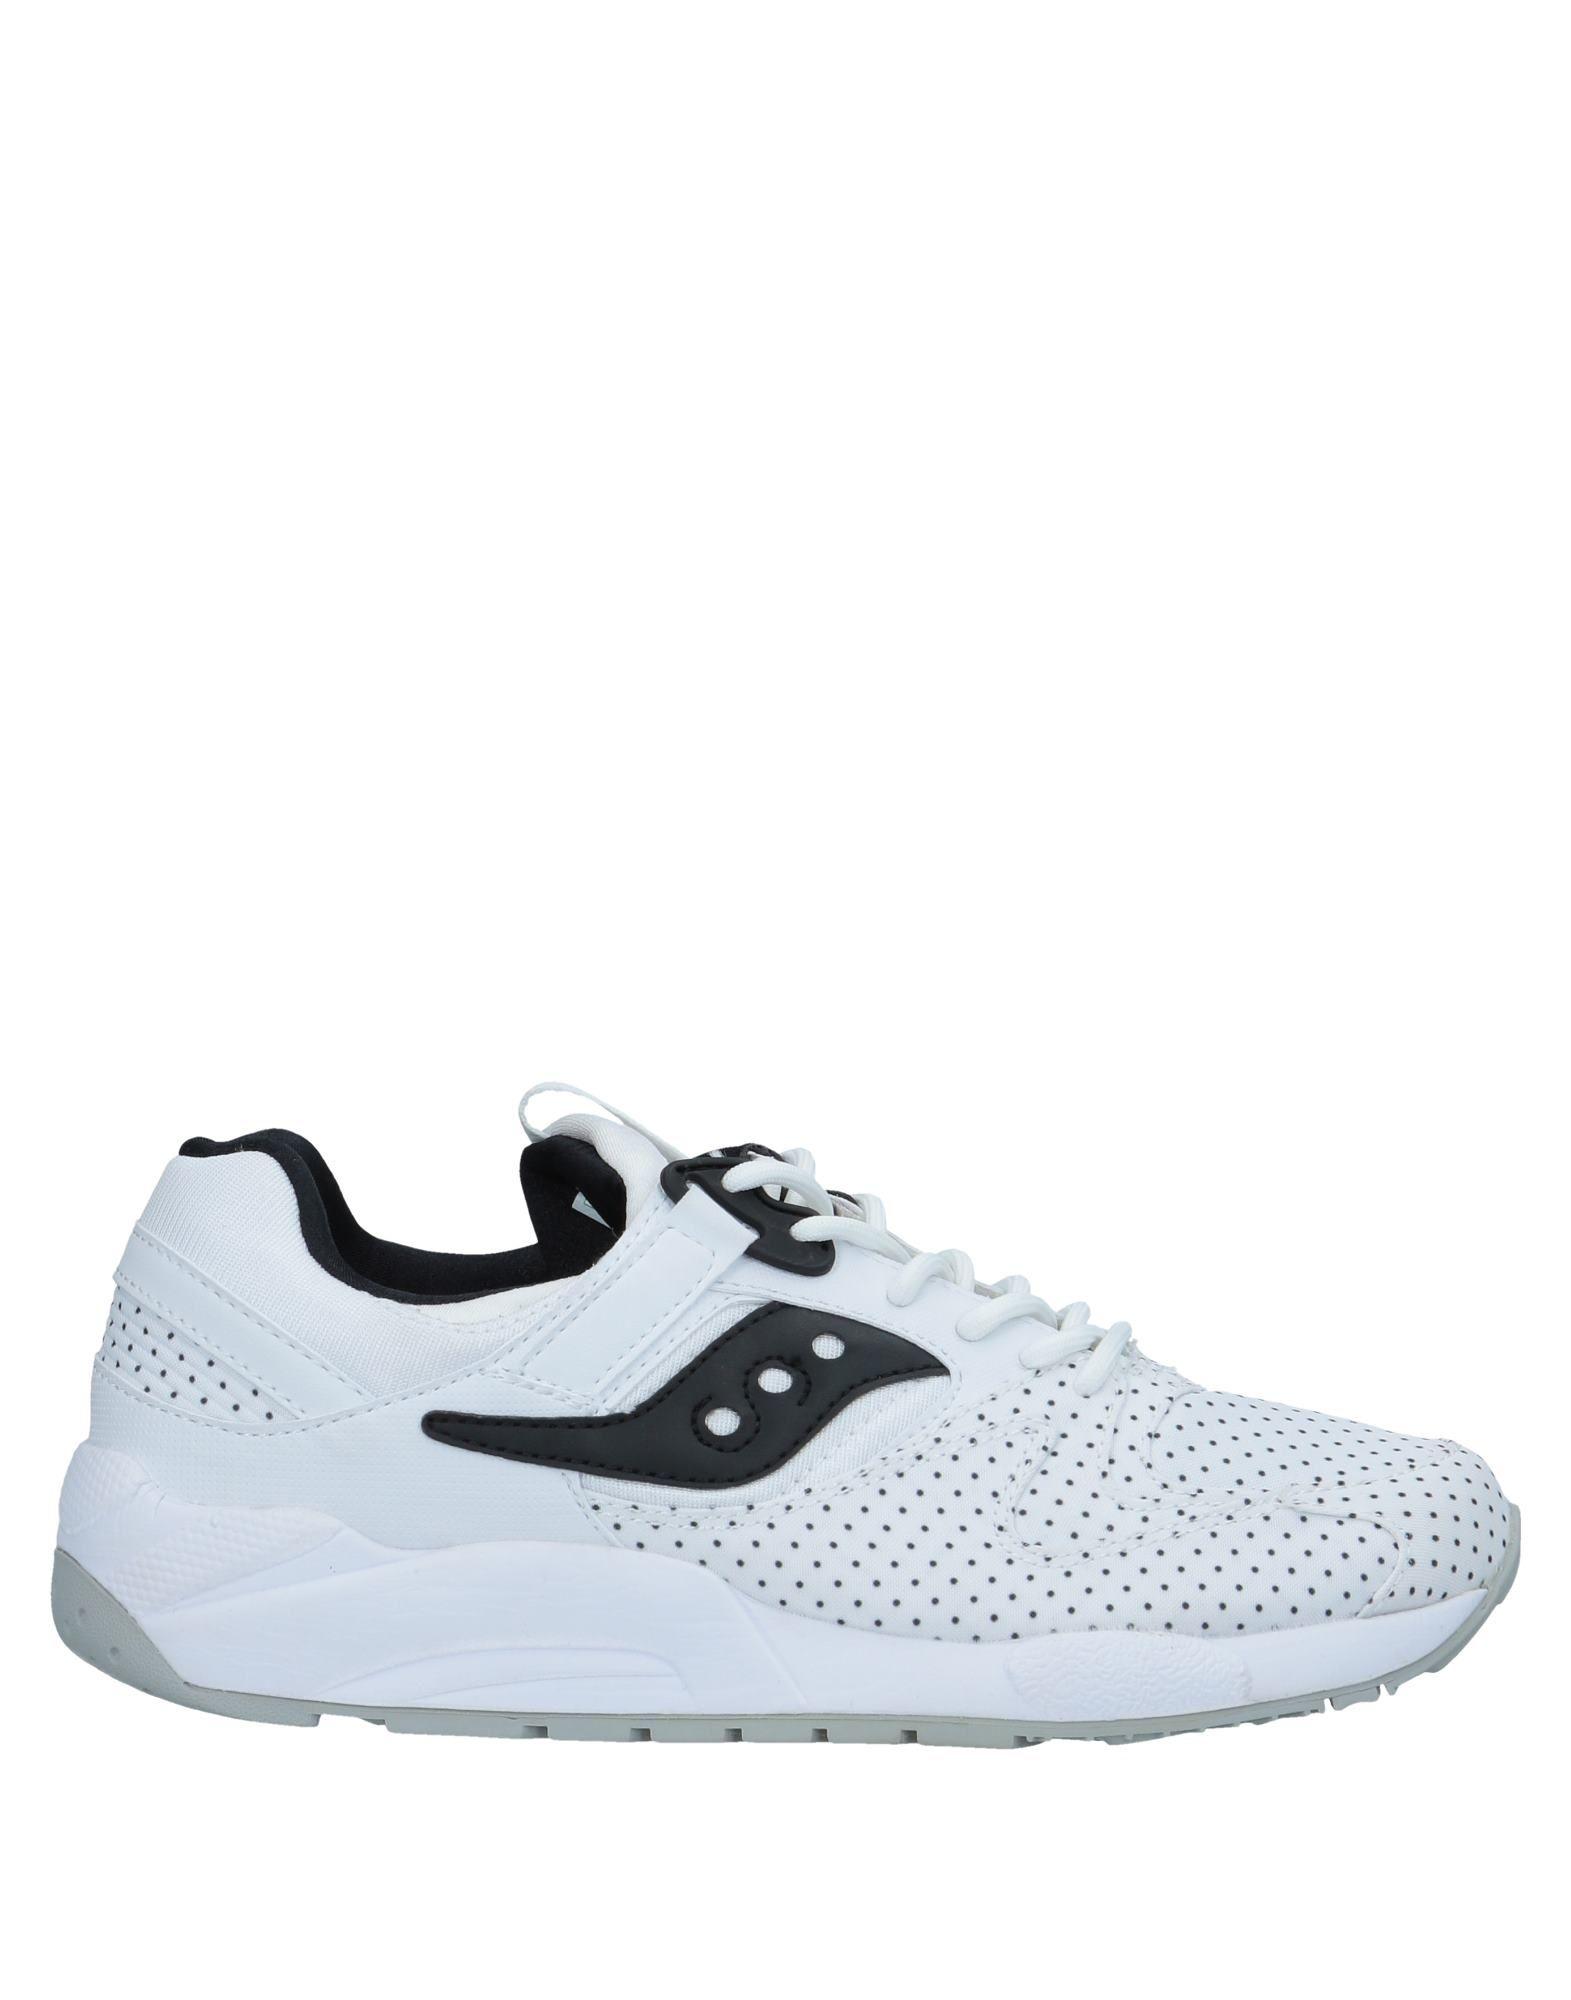 Moda Sneakers Sneakers Moda Saucony Uomo - 11500652UW 4a6198